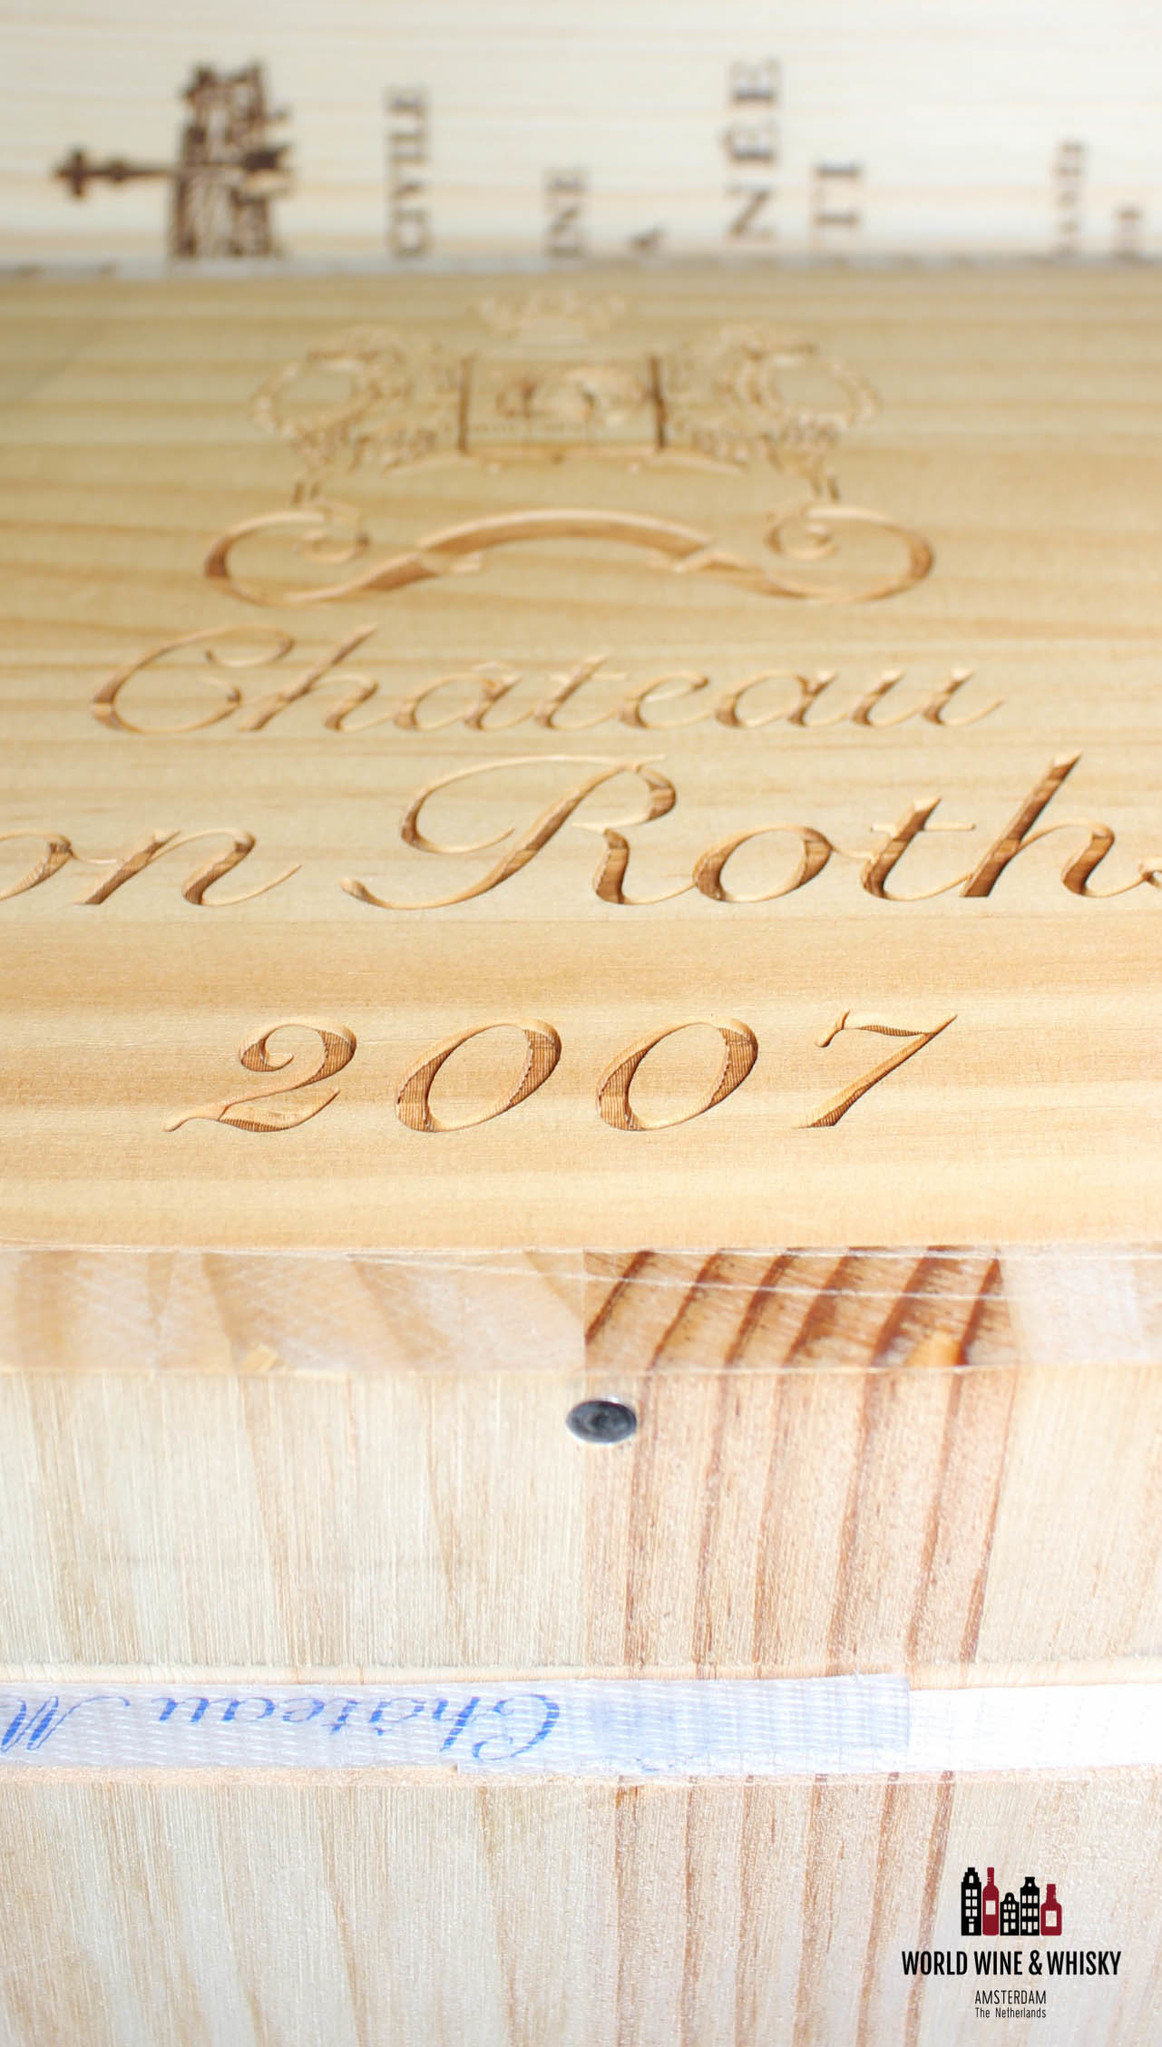 Mouton Rothschild Chateau Mouton Rothschild 2007 (sealed 12-bottles OWC)